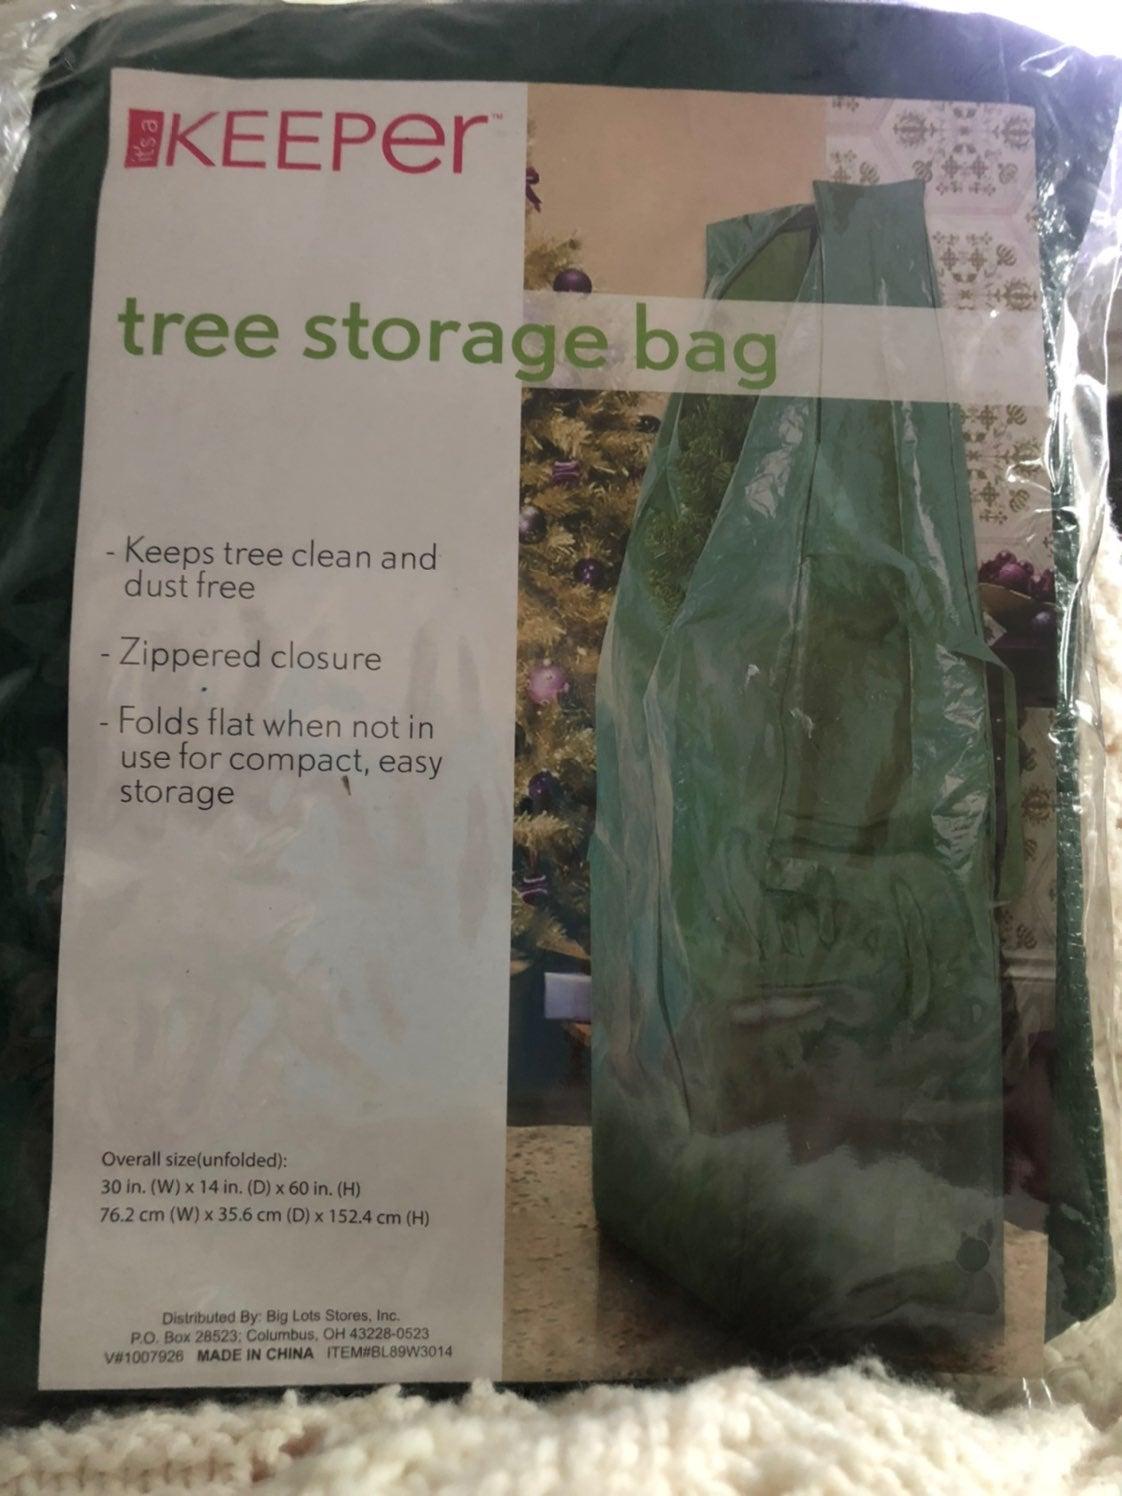 It's a Keeper Christmas Storage Bag